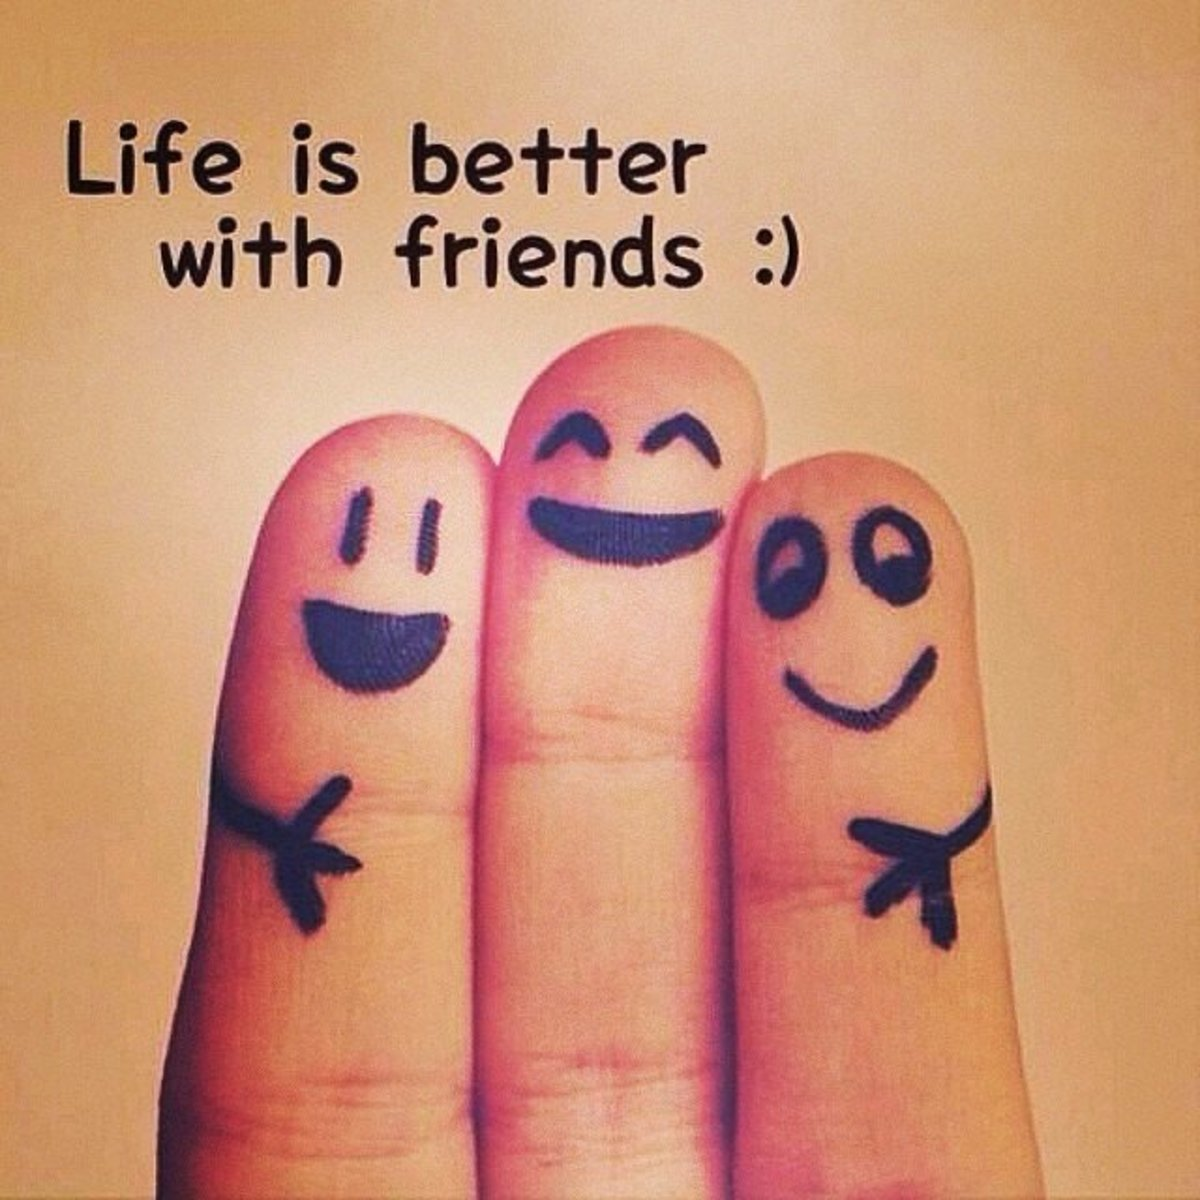 True Friendship Does Exist!